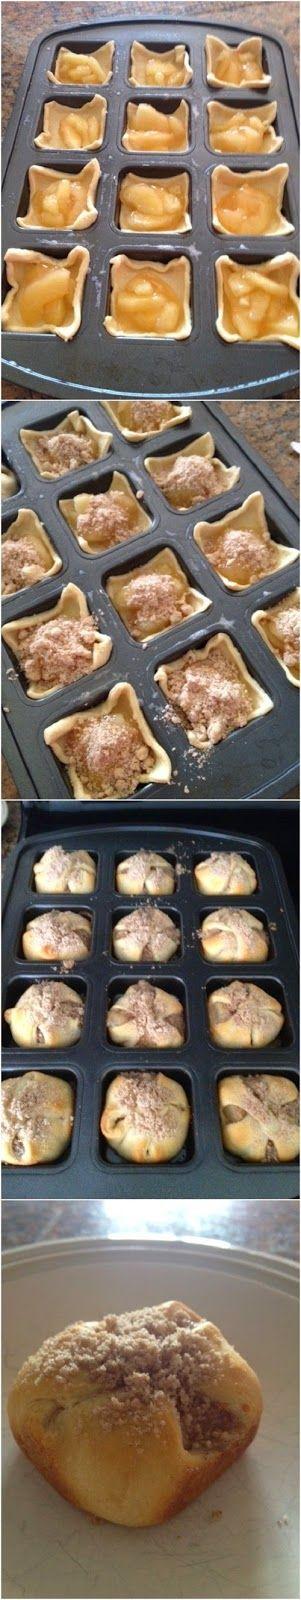 Mini Apple Pies - knowkitchen